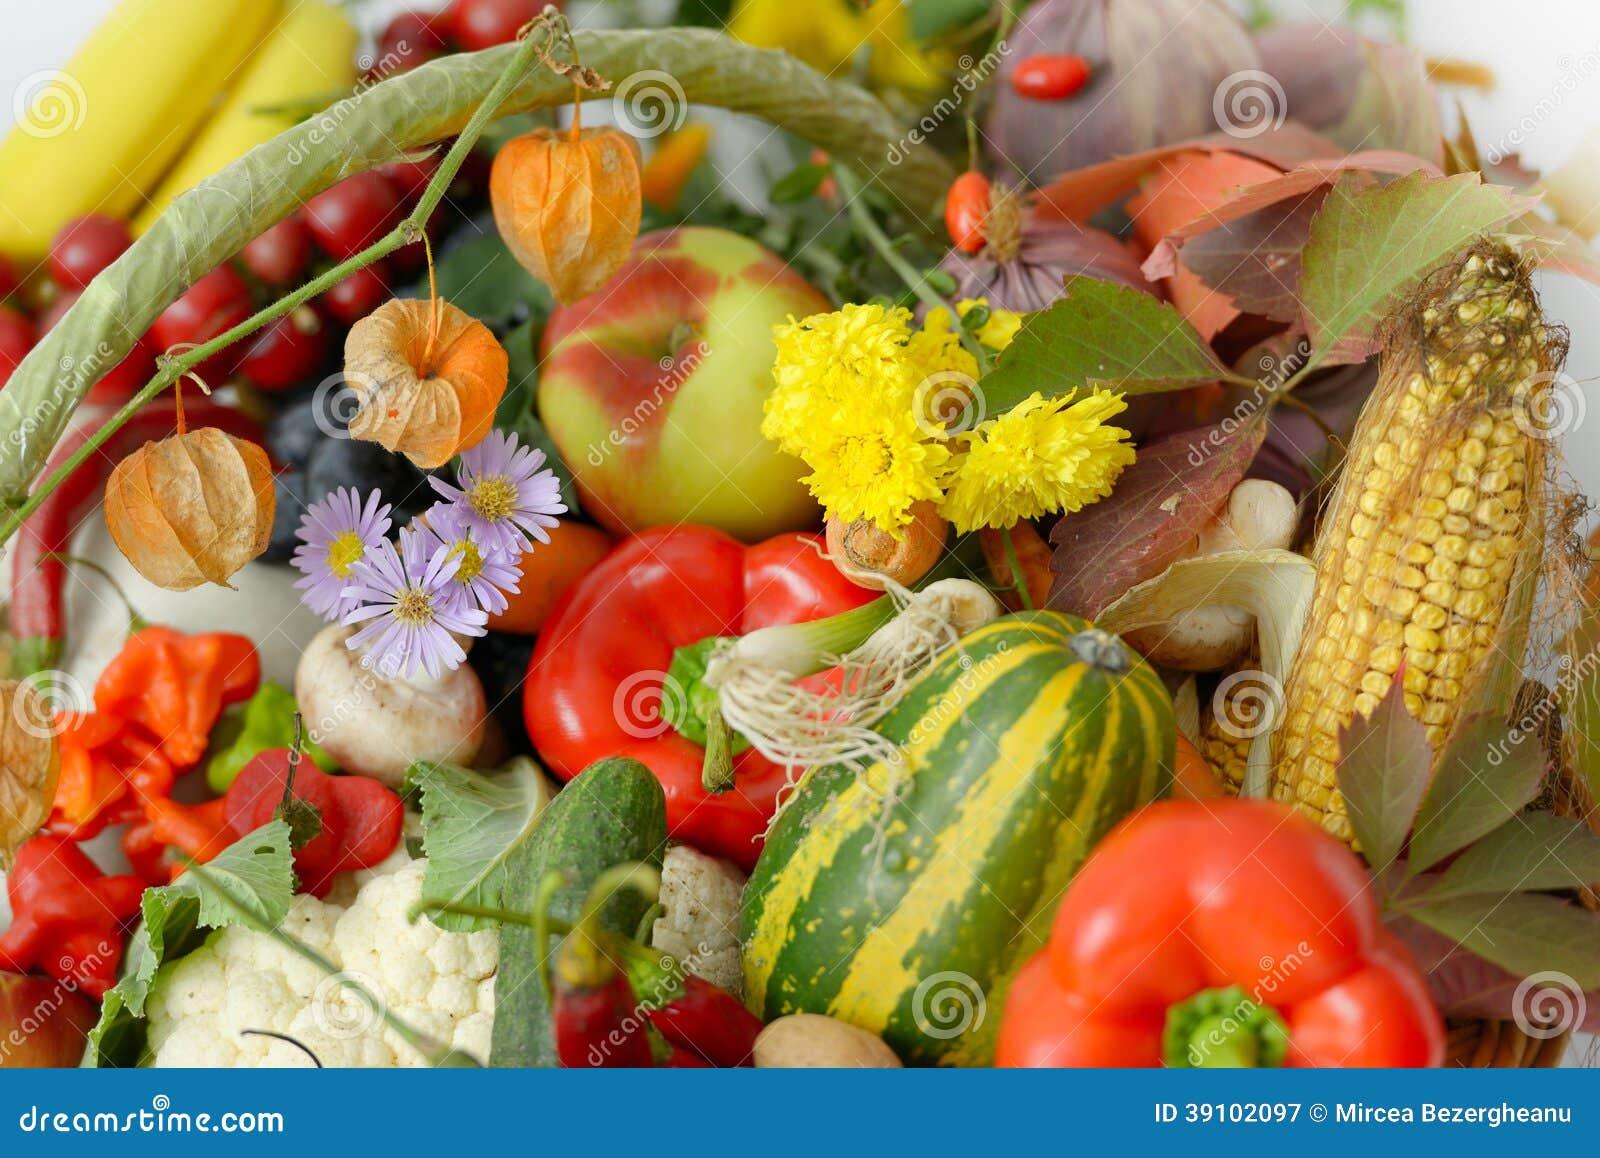 Verse vruchten en groenten